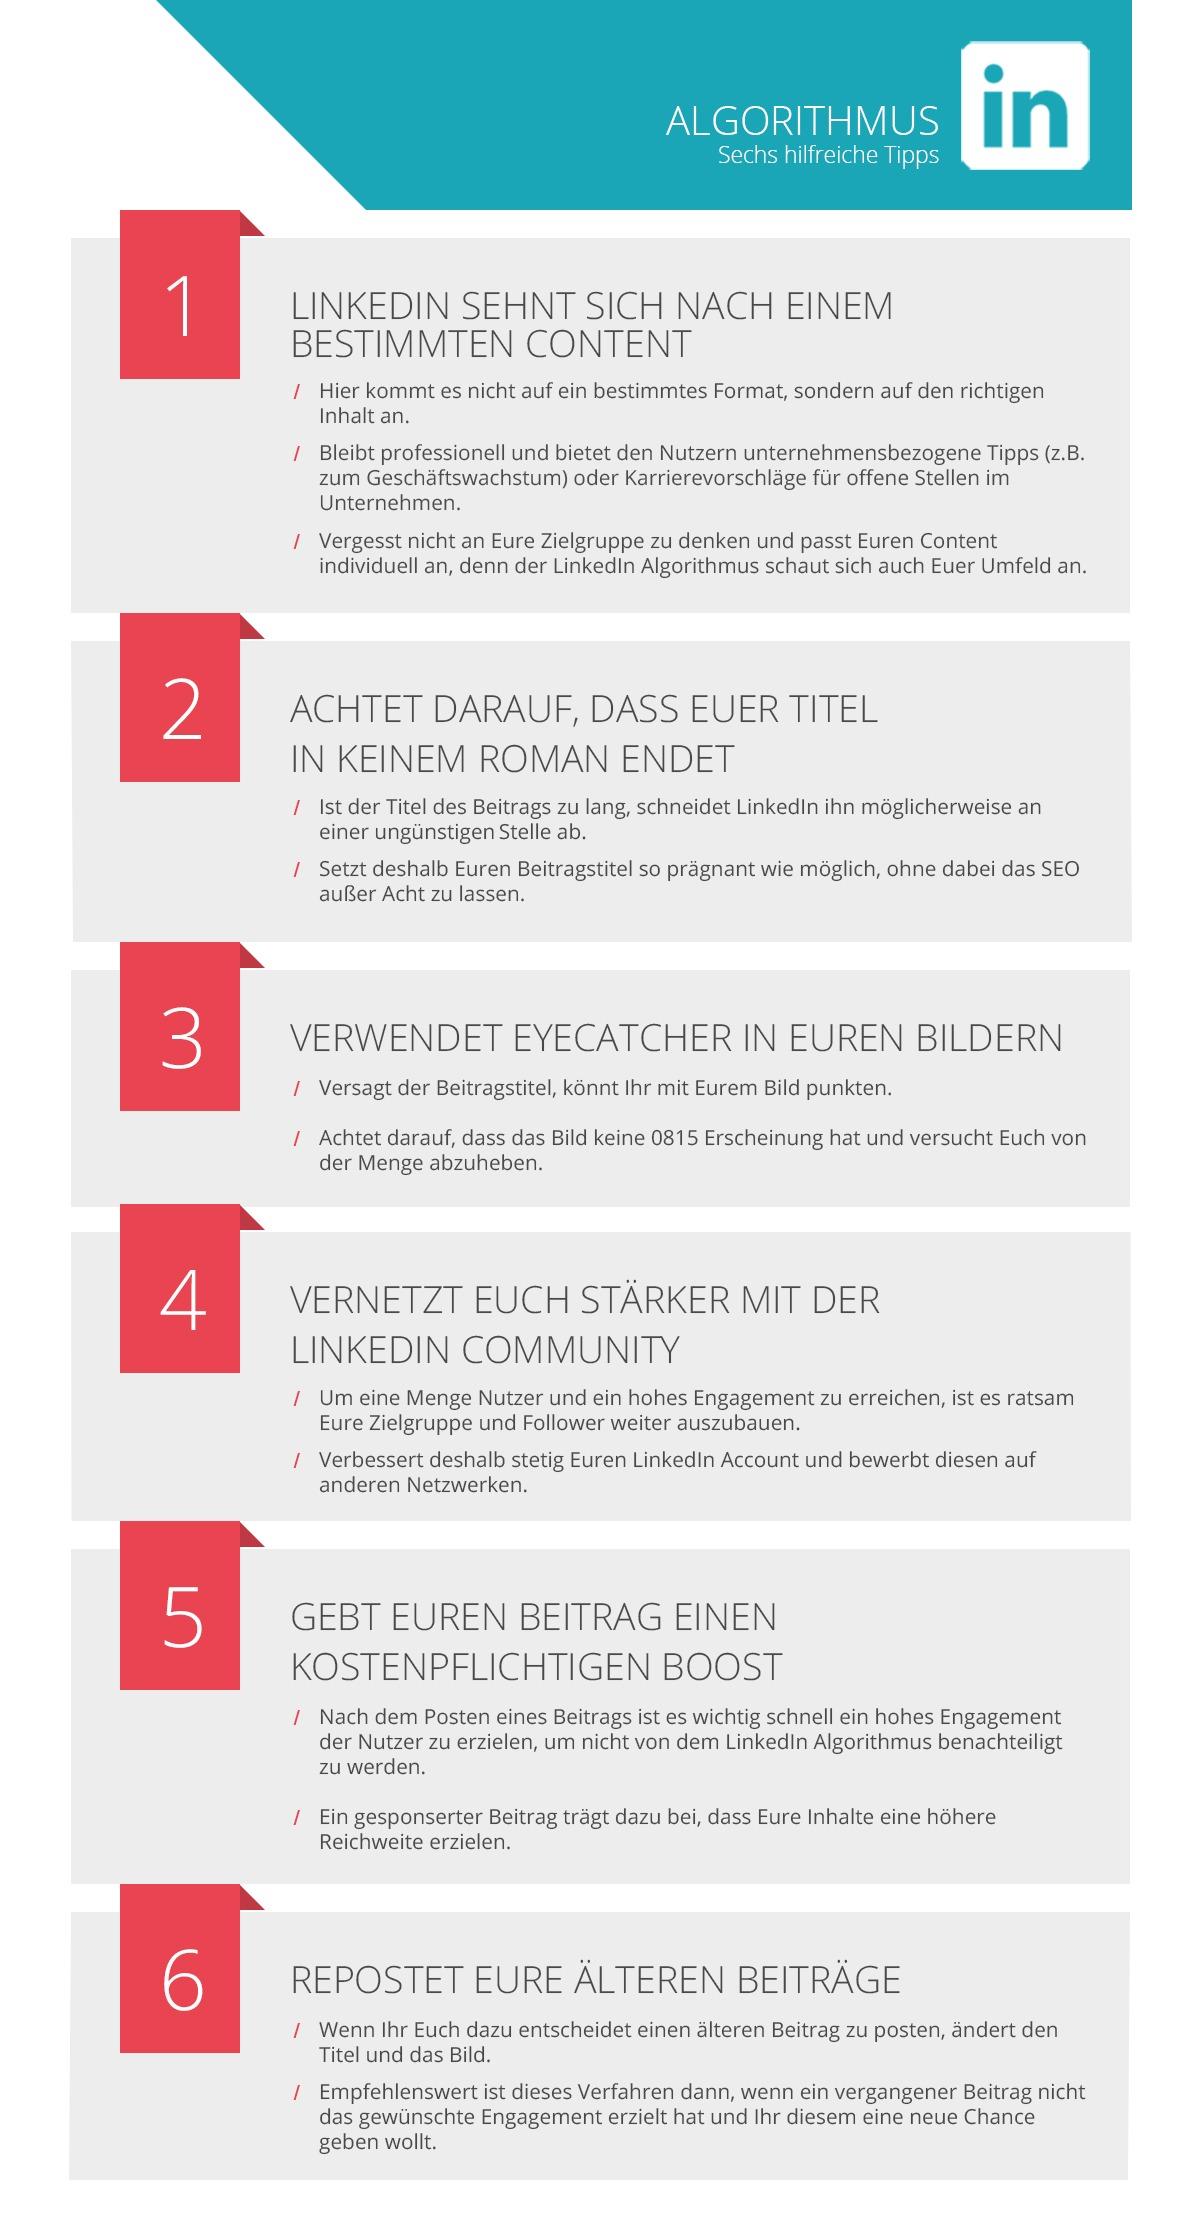 LinkedIn; LinkedIn Algorithmus; Tipps